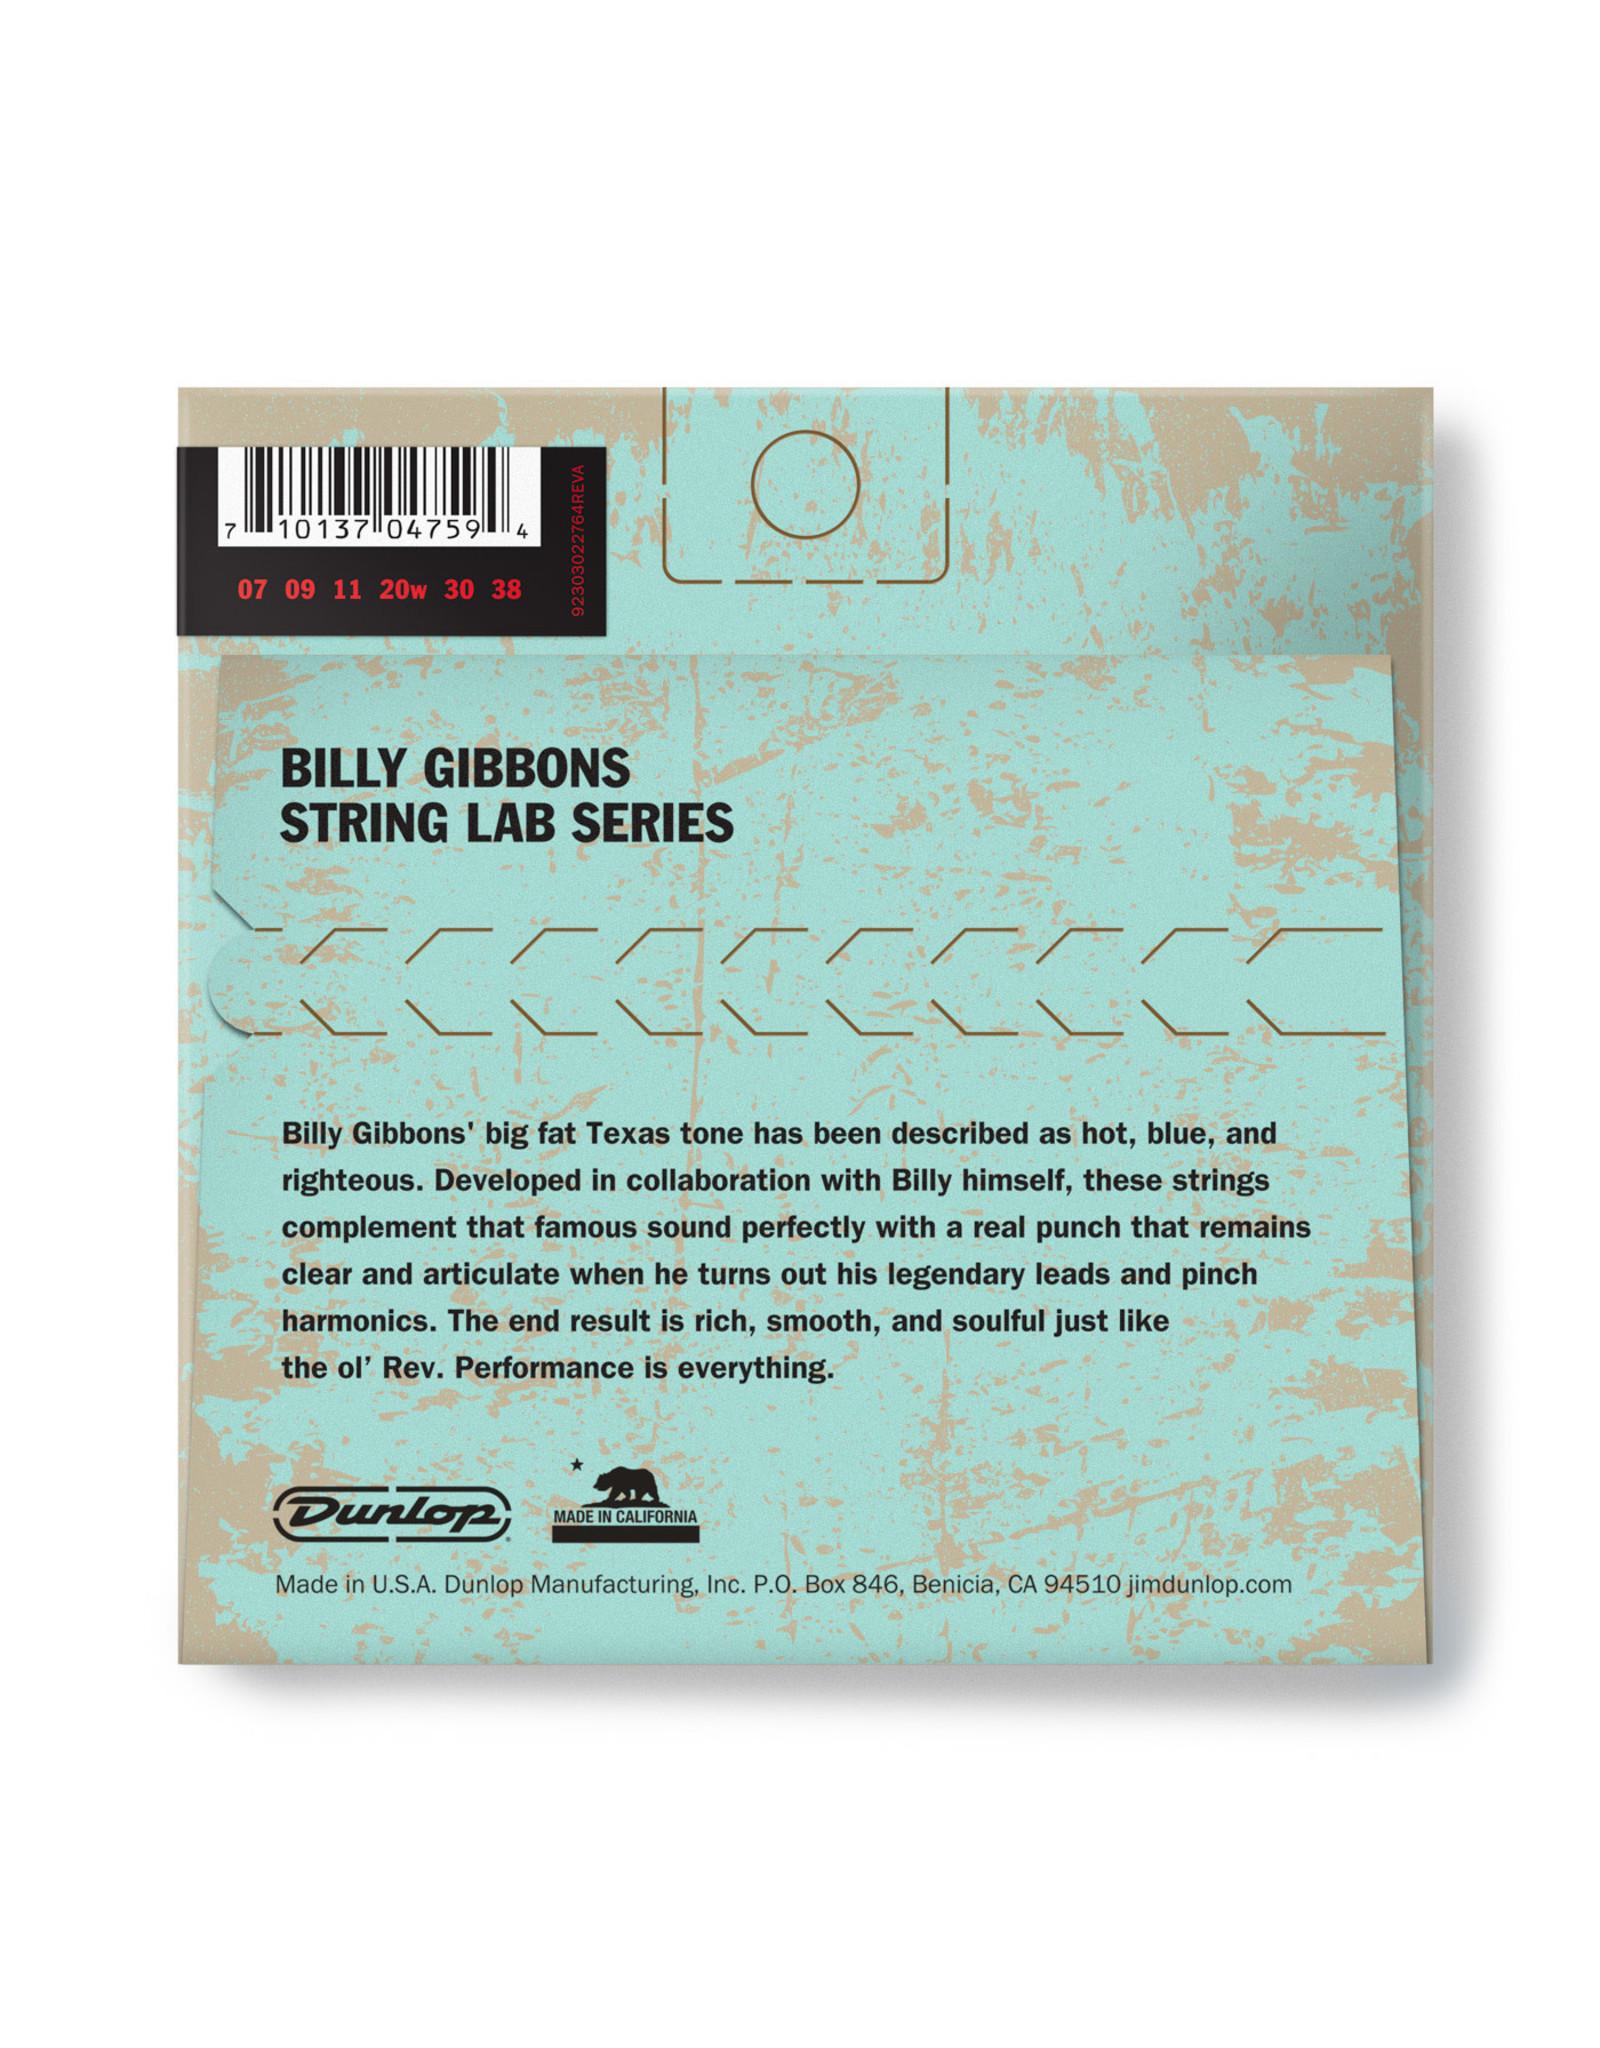 Dunlop Dunlop Billy Gibbons String Lab Series 07/38